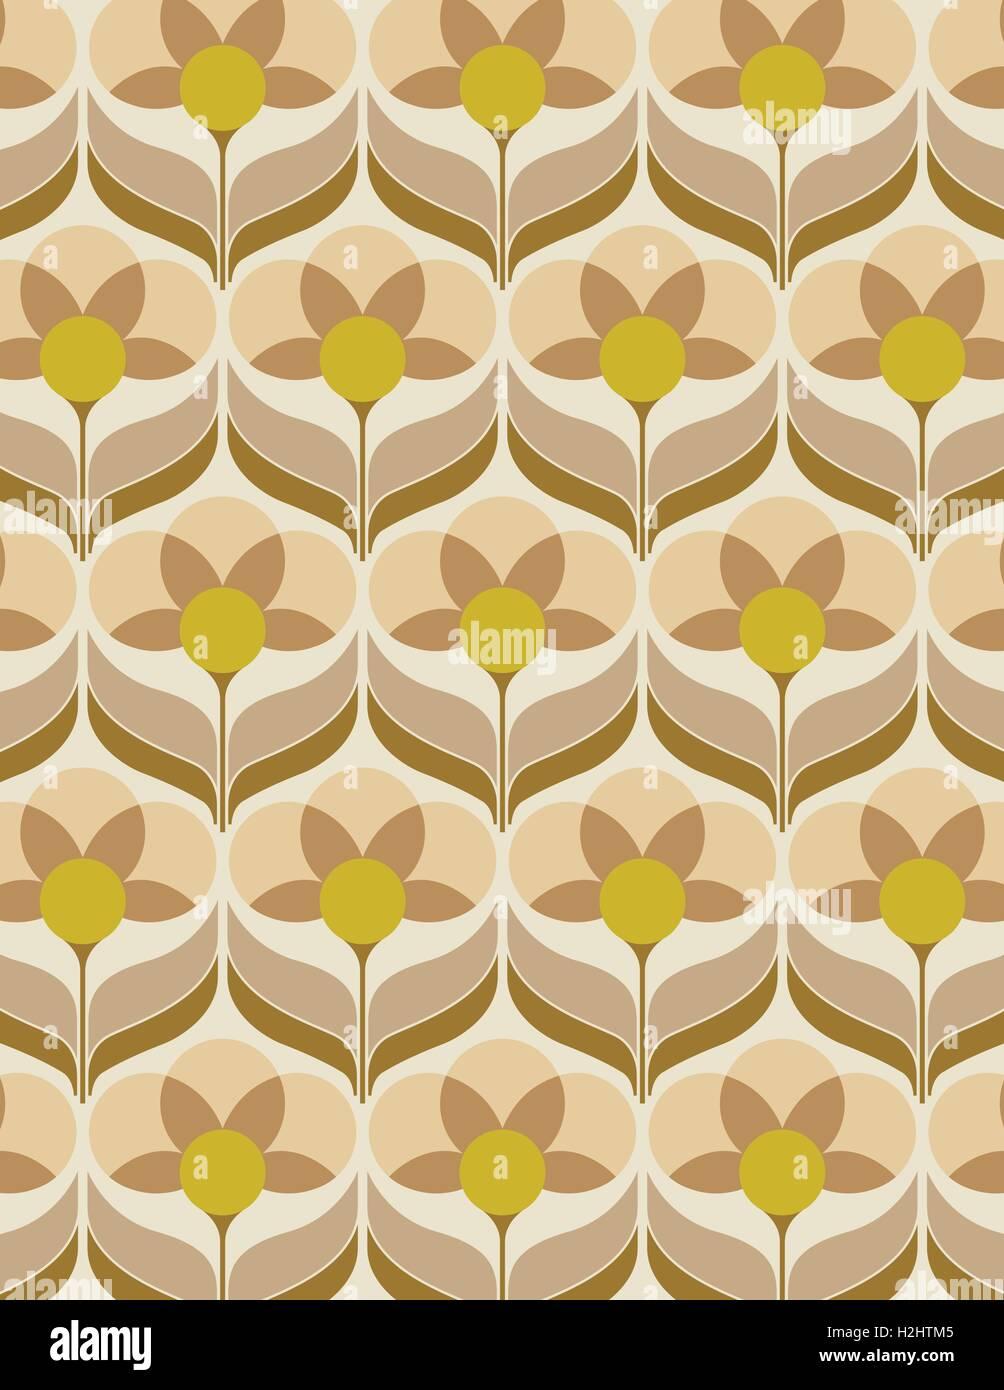 Sixties flower wallpaper - Stock Image